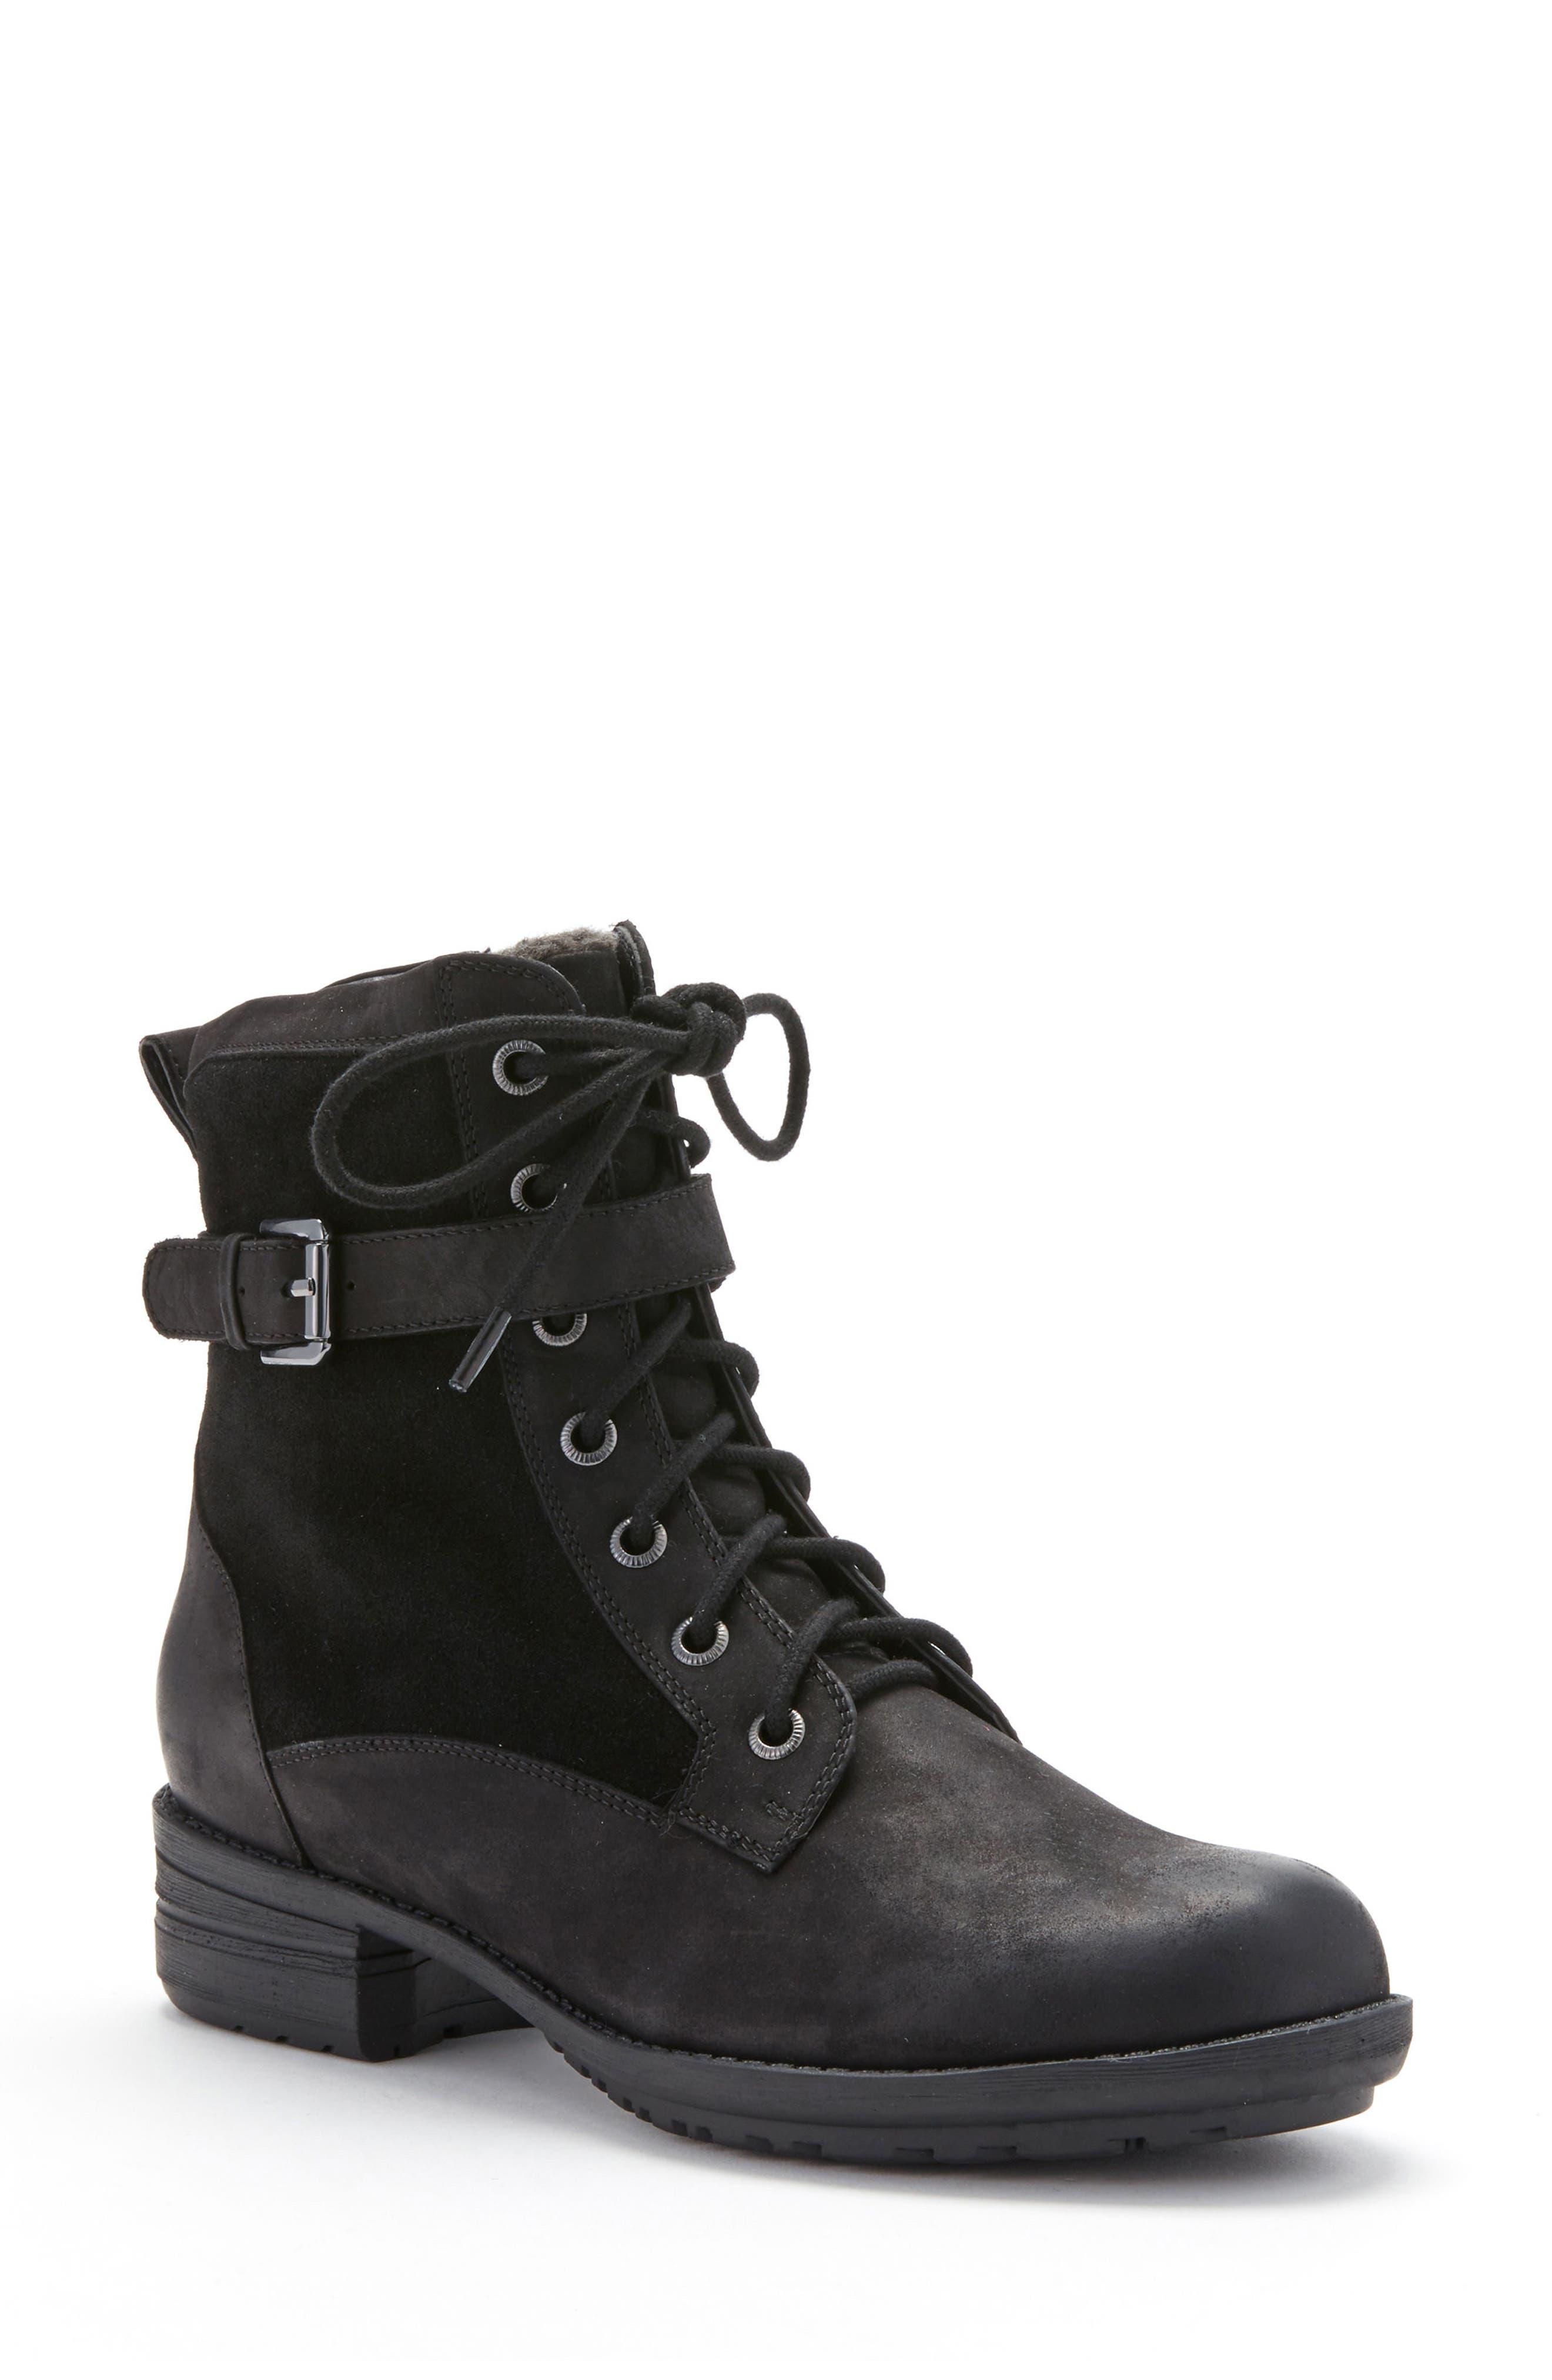 Alternate Image 1 Selected - Blondo Tunes Waterproof Moto Boot (Women)